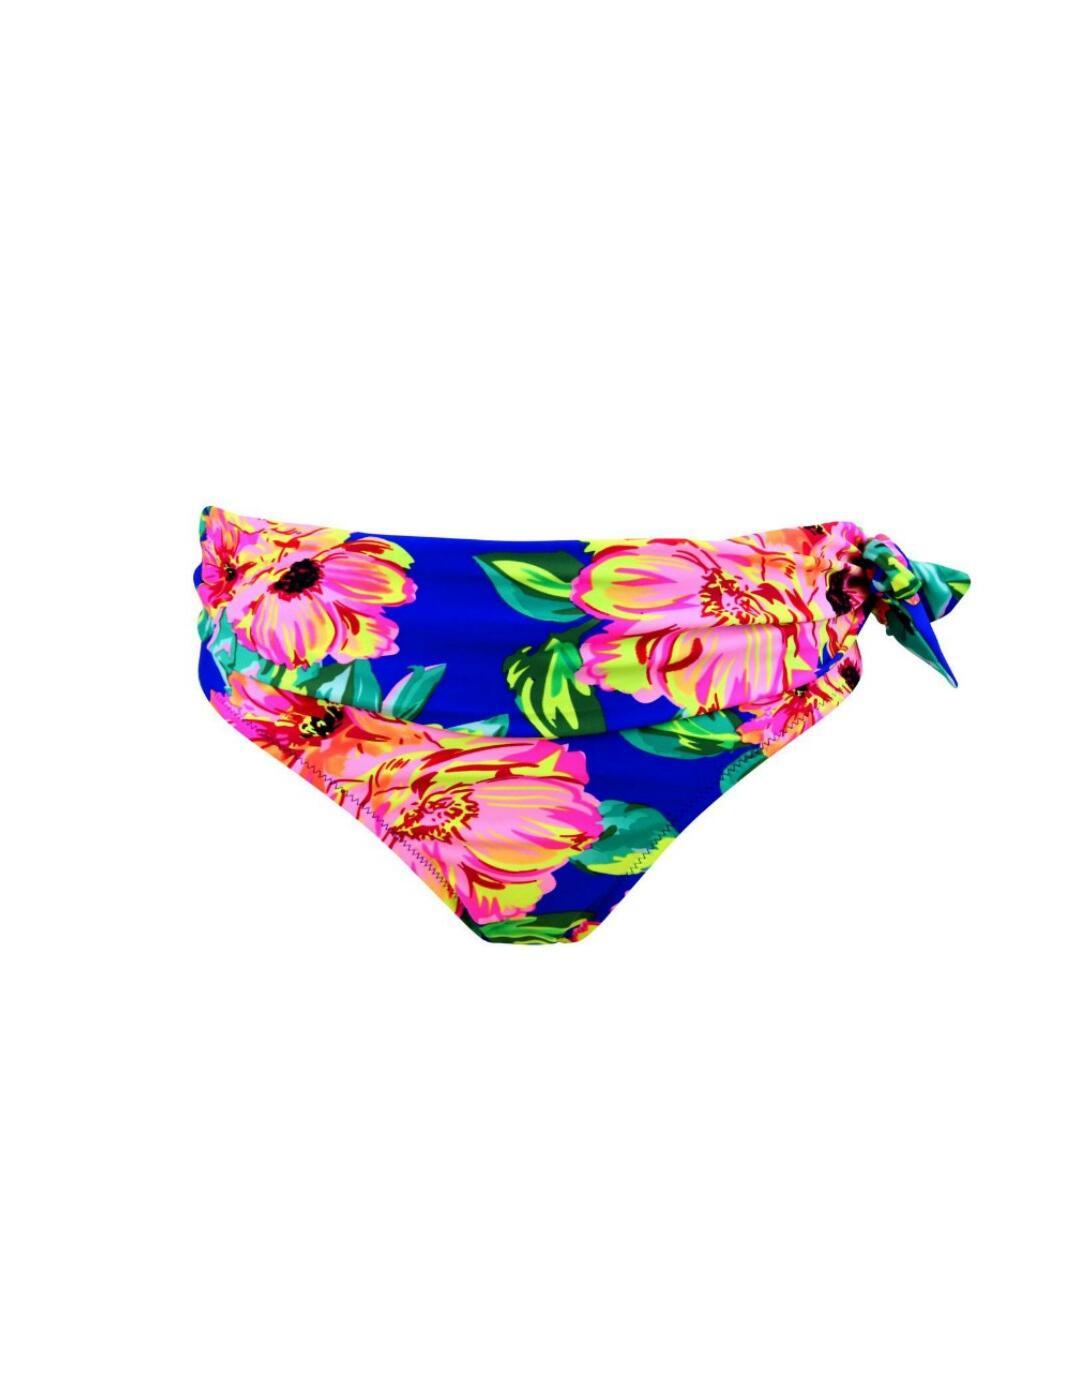 Pour-Moi-Heatwave-Fold-Over-Bikini-Brief-Bottoms-86003-New-Womens-Swimwear thumbnail 6